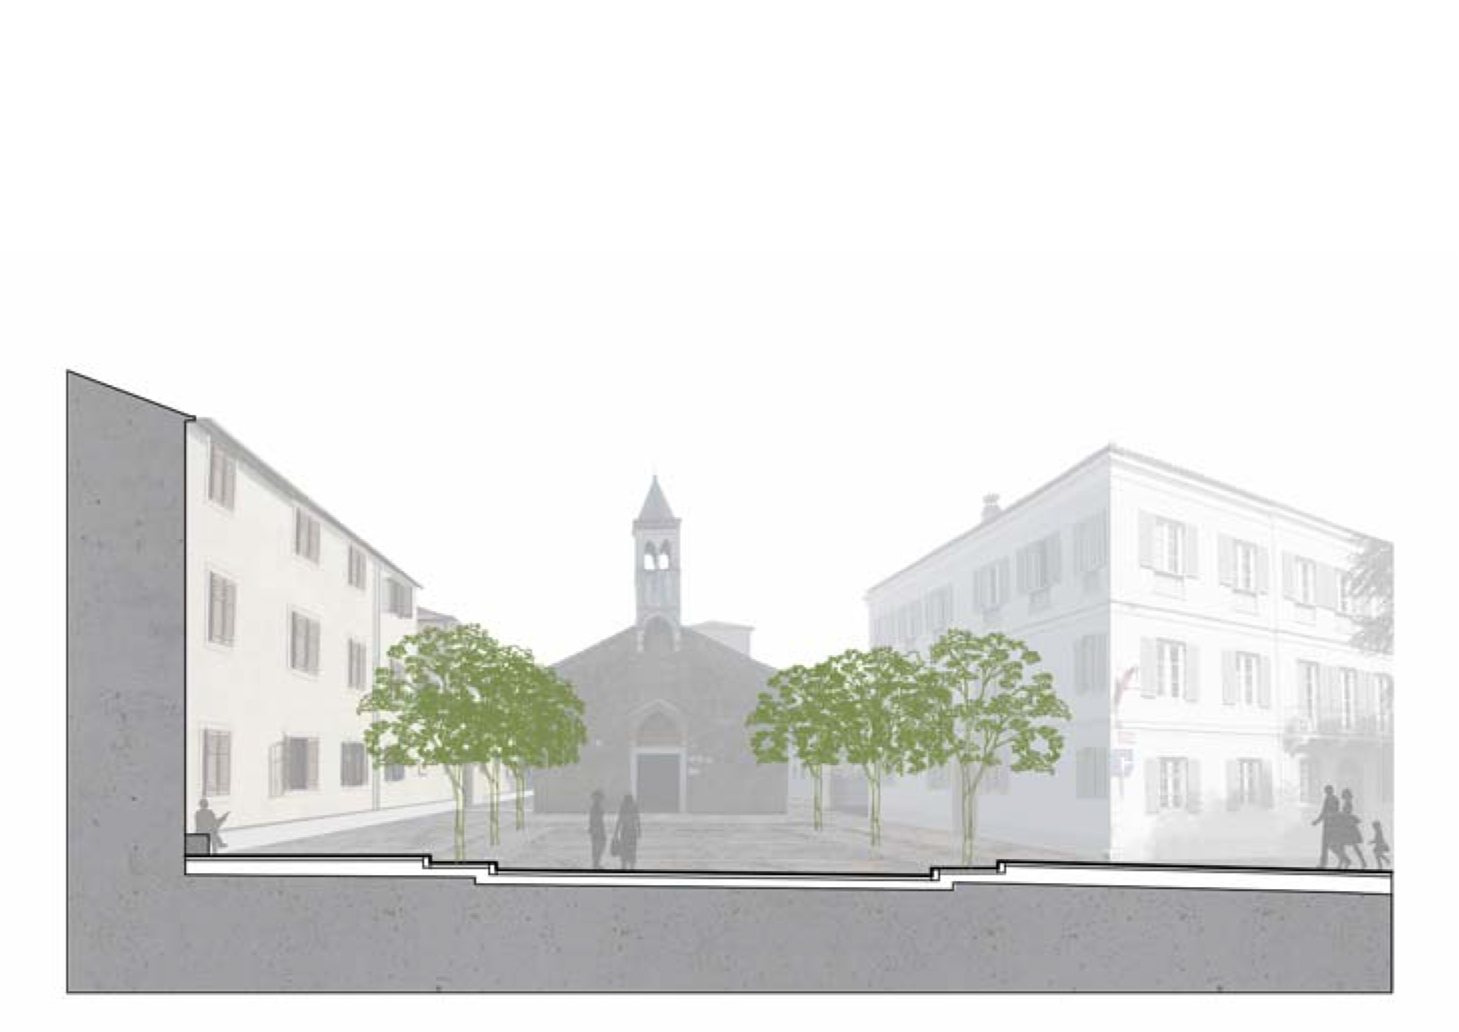 Architecture_Kombinat-Tina Rugelj_section B_Brolo square.jpg